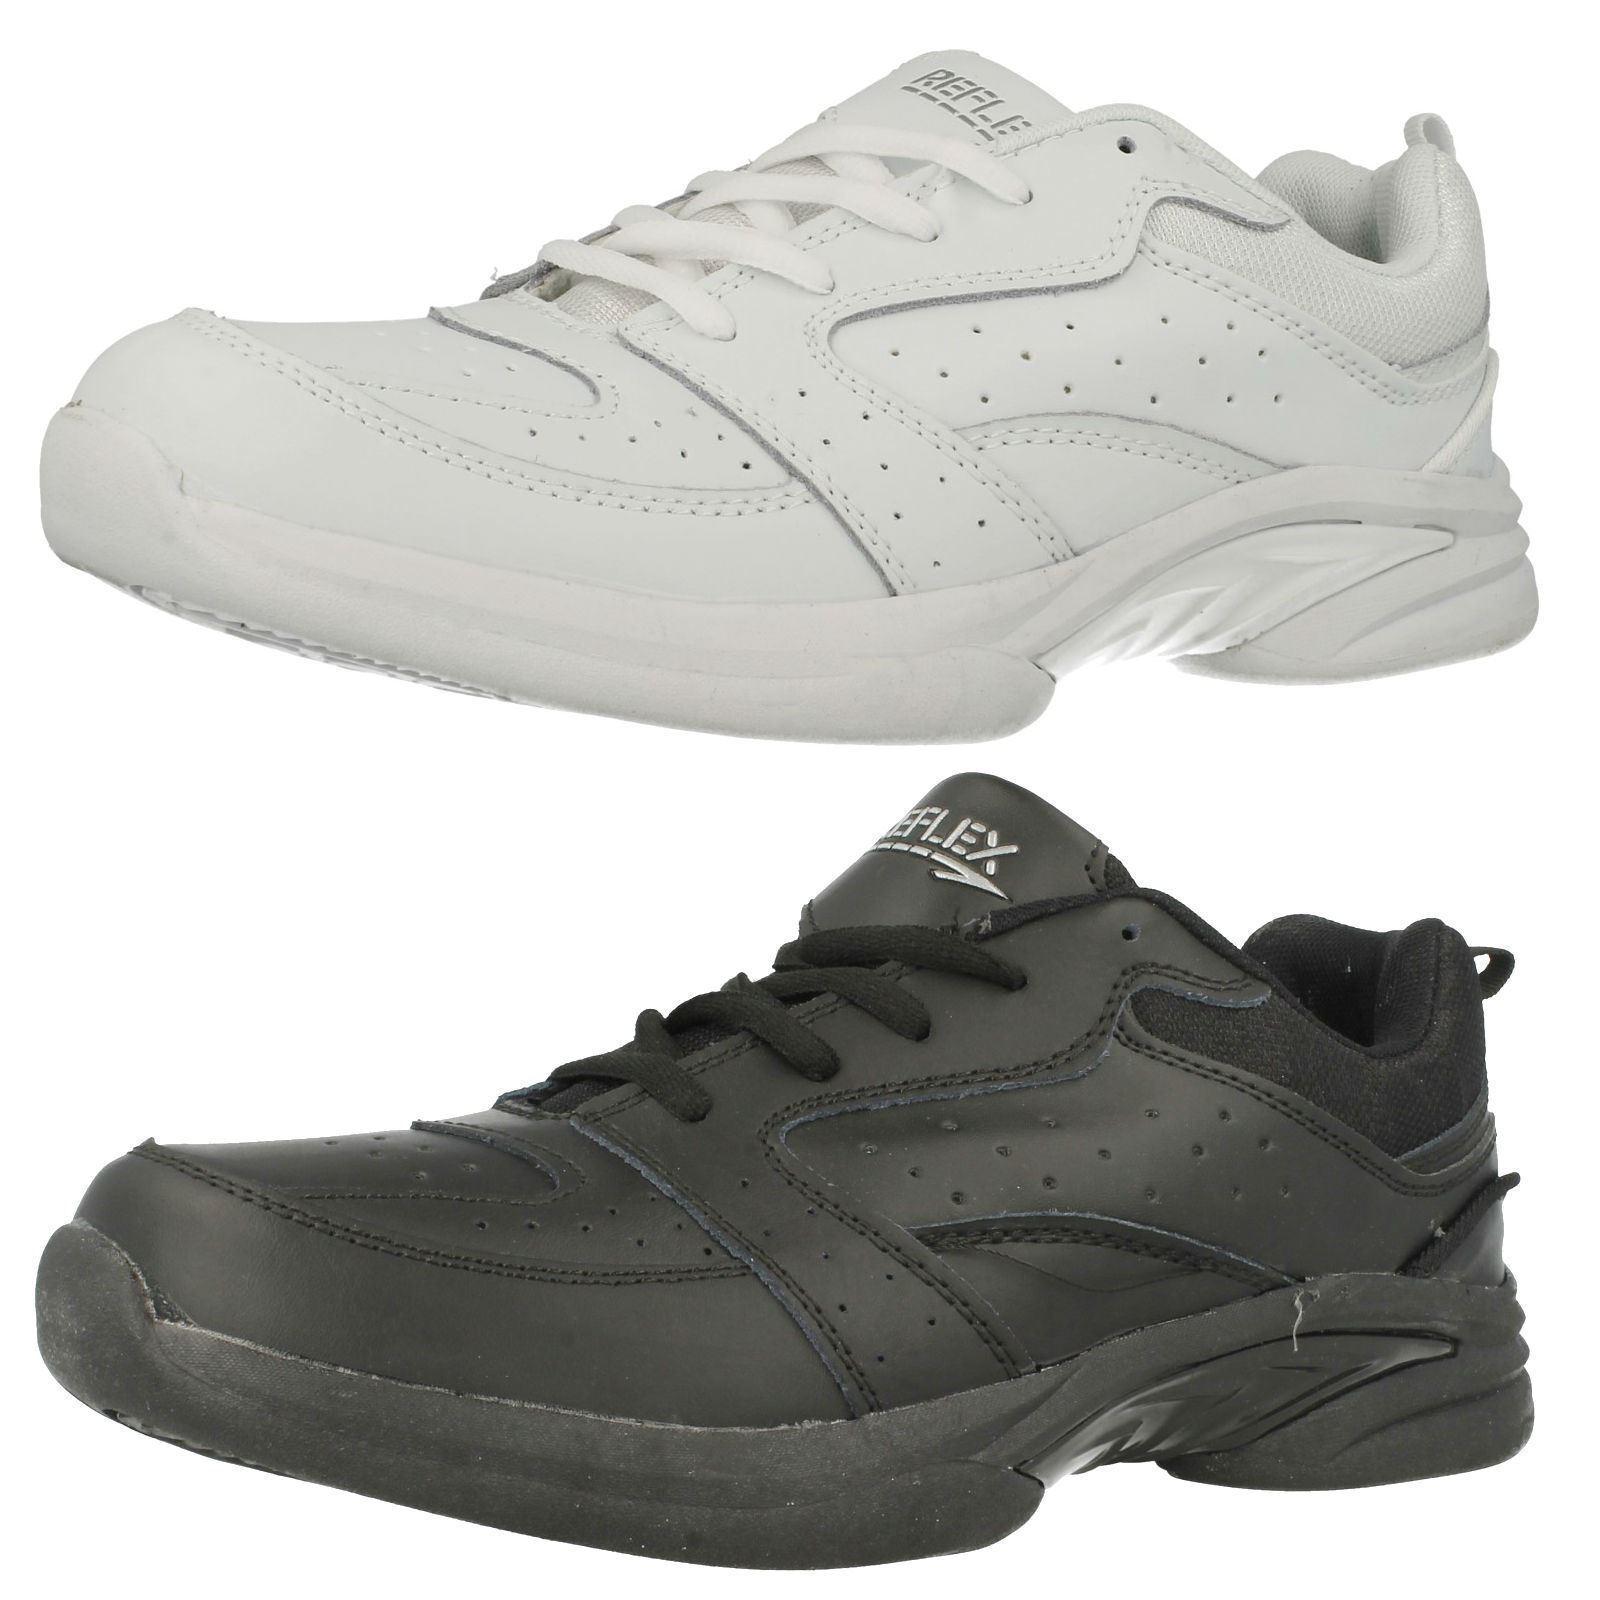 Hombre Reflex Negro/Zapatillas Sizes Blancas con Cordones Gb Sizes Negro/Zapatillas 7-12 A2R124 177c48